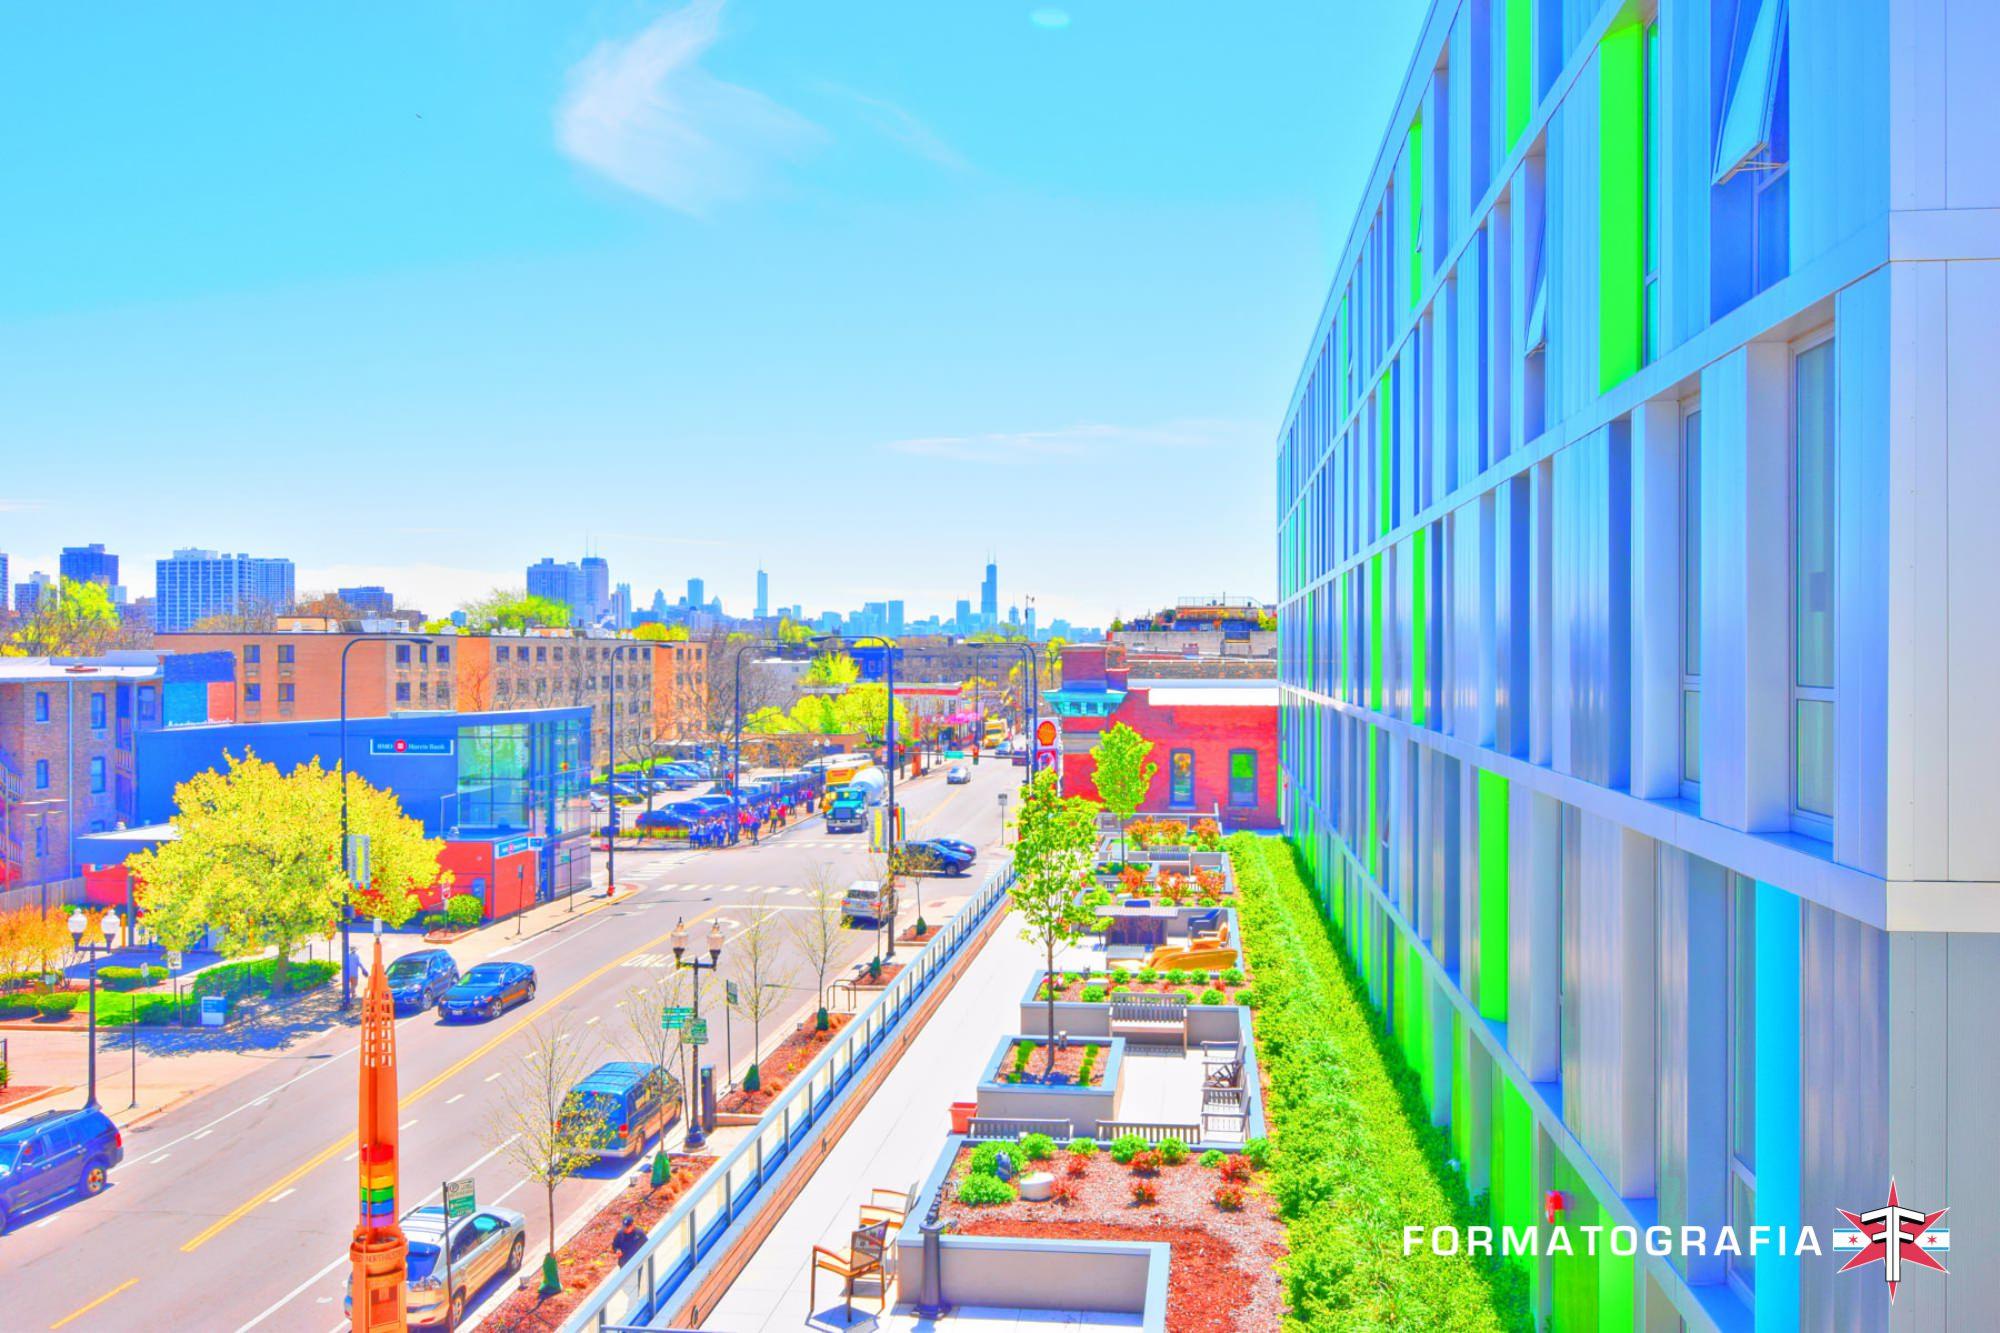 eric formato chicago photographer fall update city architecture shotsDSC_0144_tonemapped3.jpg